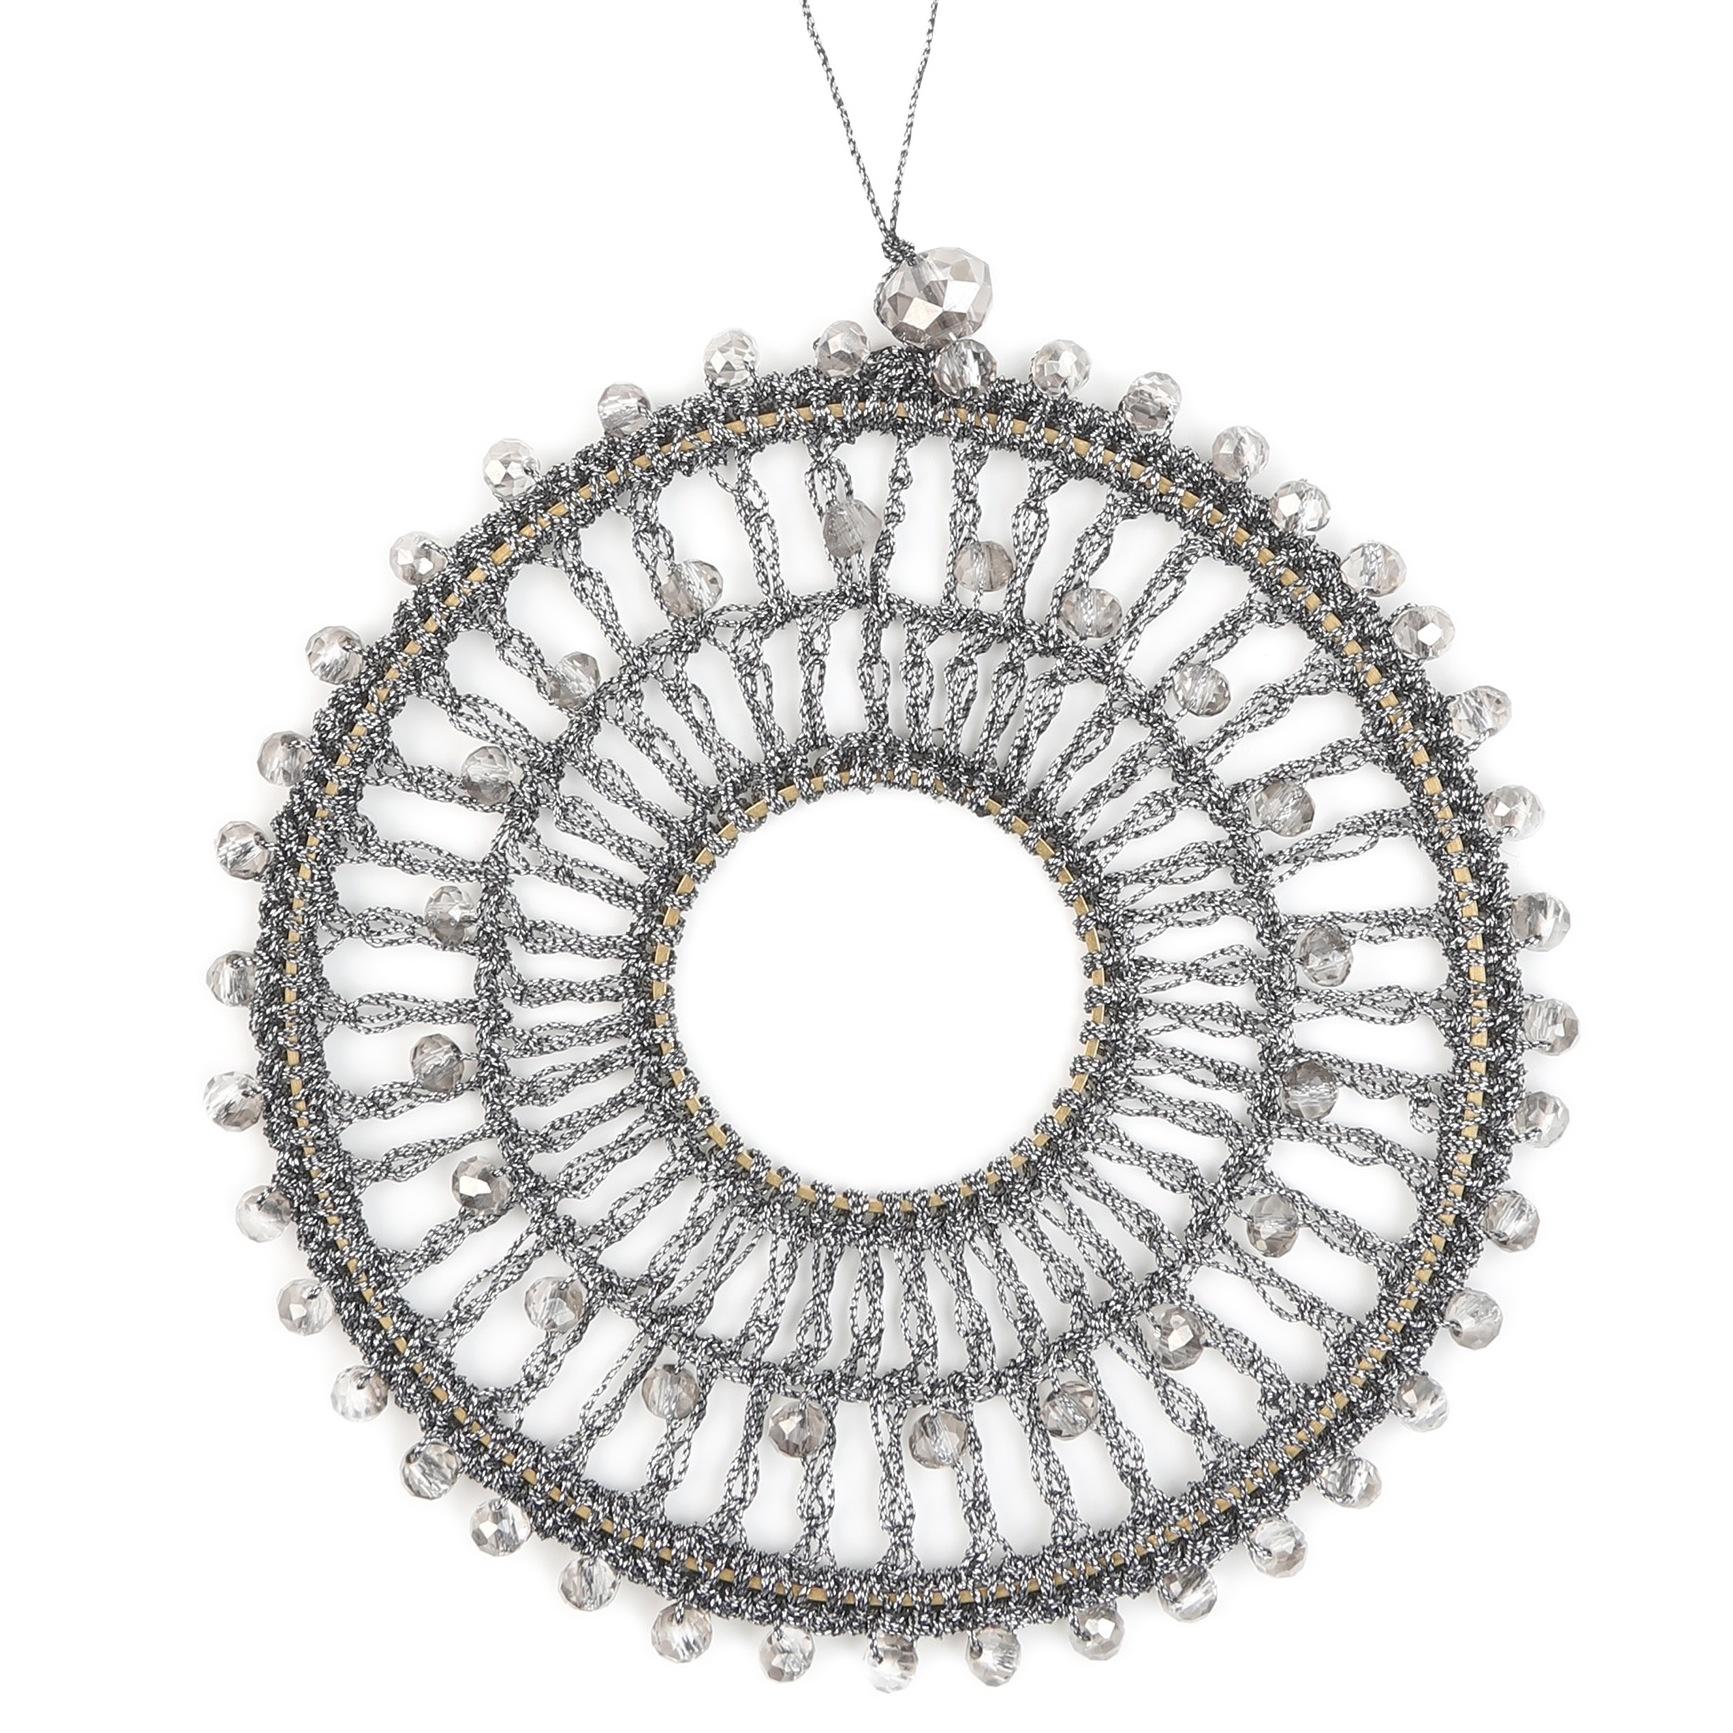 Bellizzi  deco hanger Handmade - Antracite - Ø 9cm  - 6 stuks